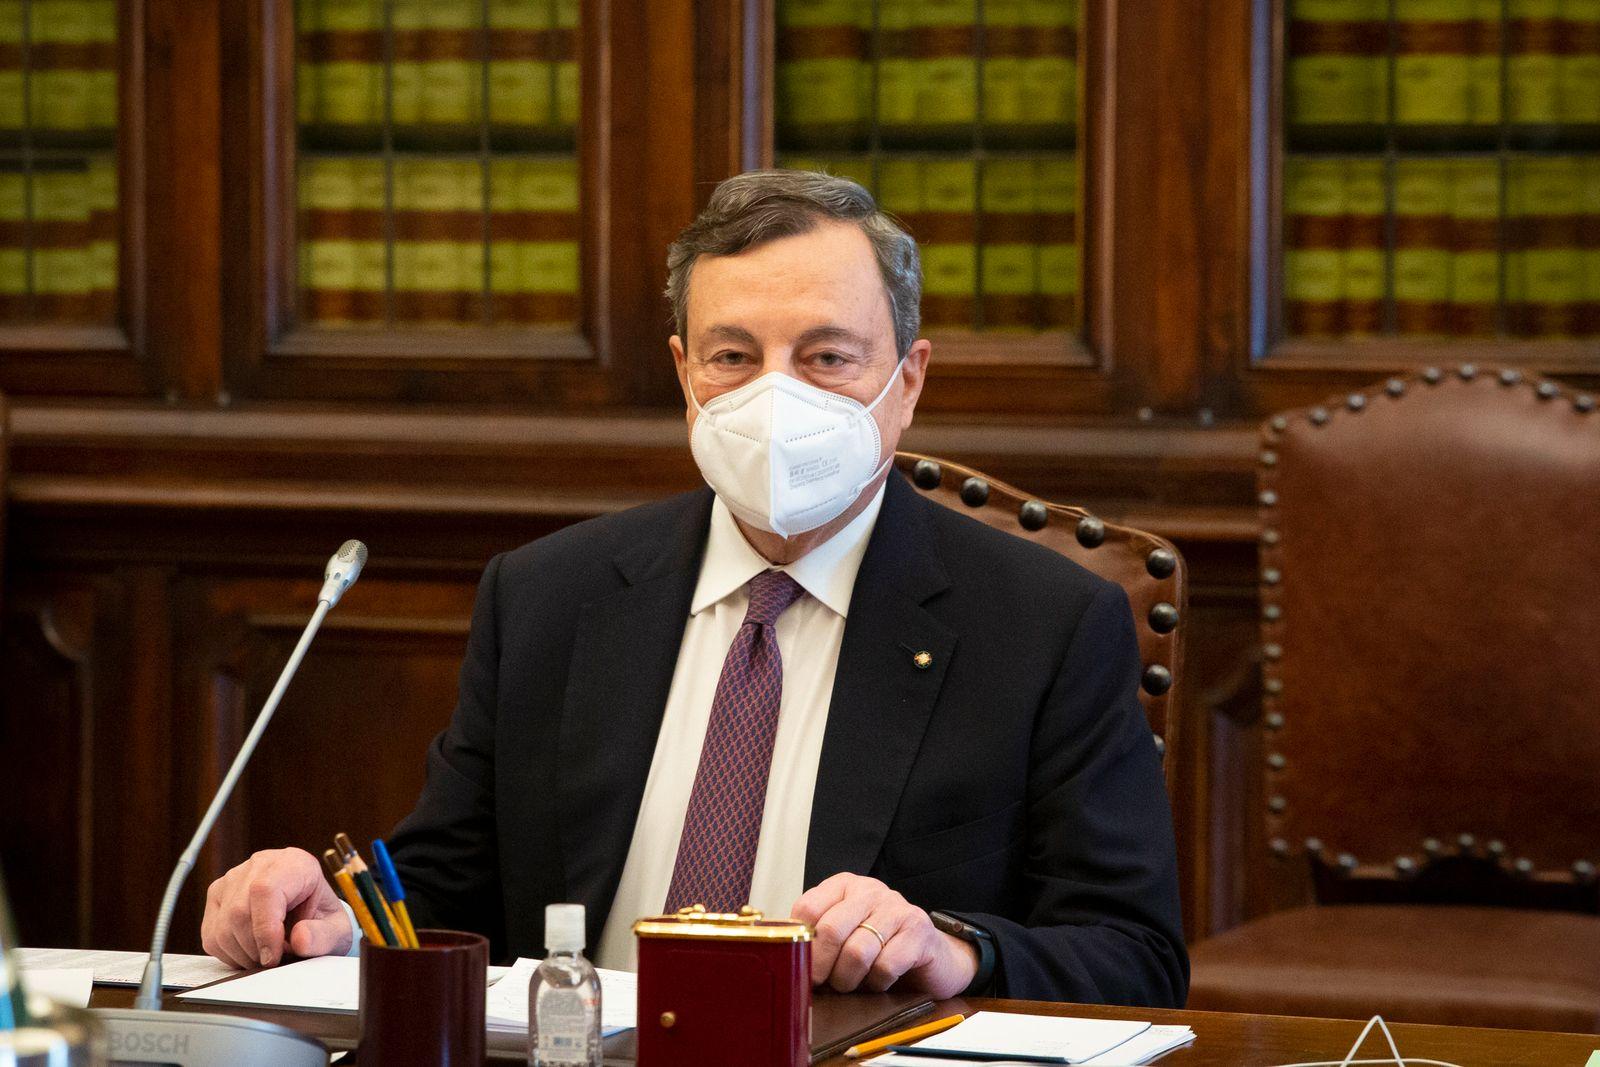 Regierungskrise in Italien